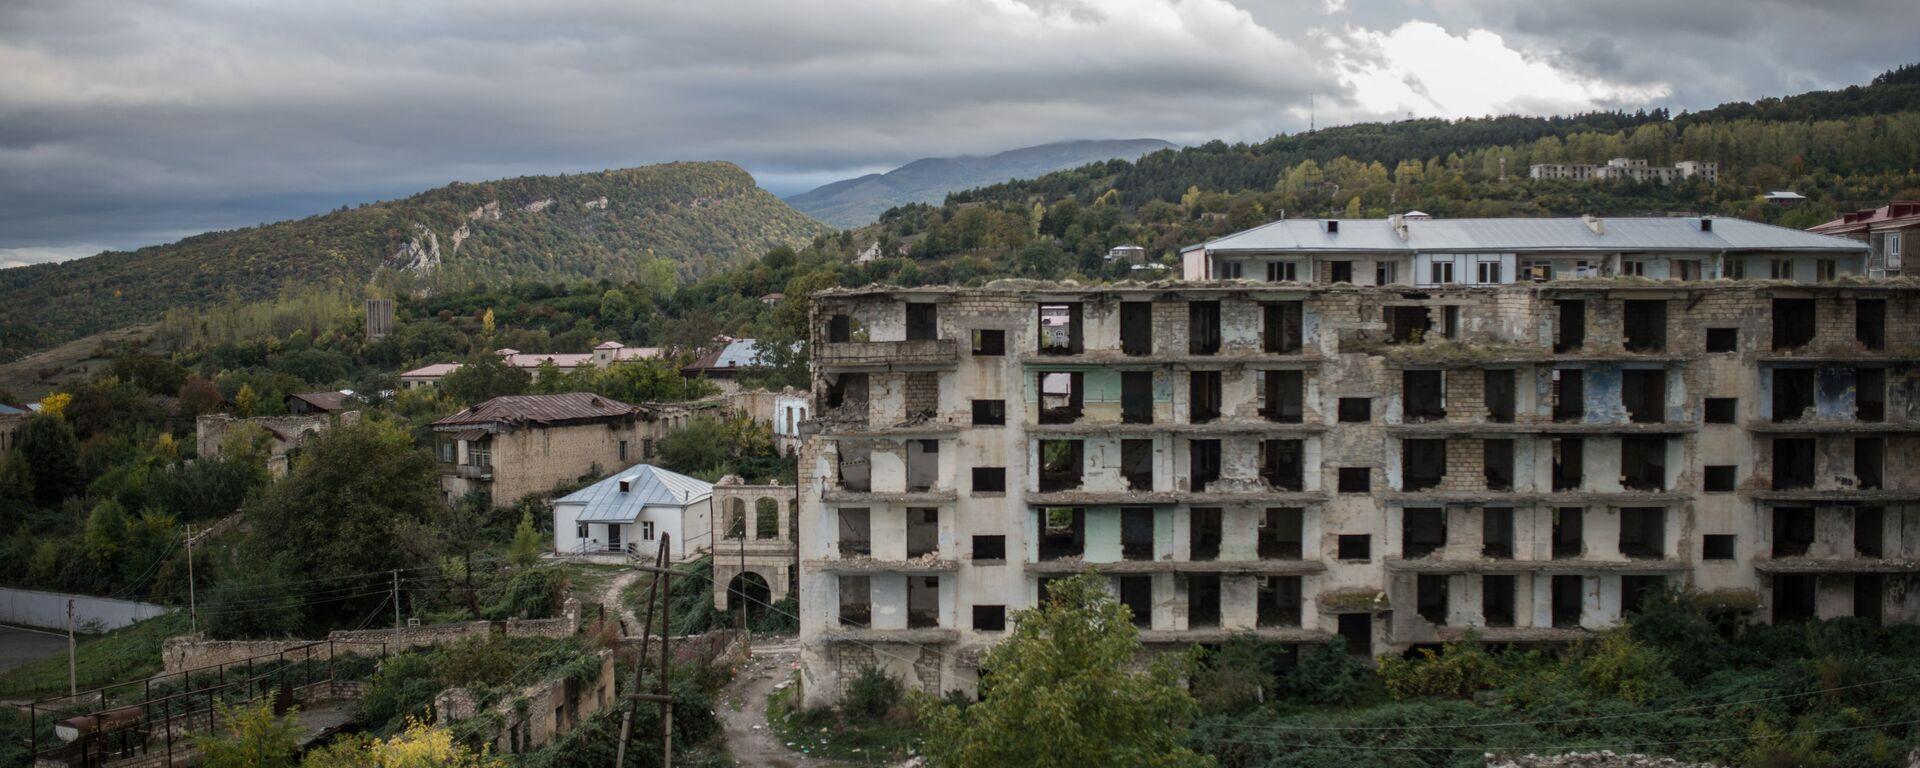 Case distrutte a Nagorno-Karabakh - Sputnik Italia, 1920, 12.03.2021